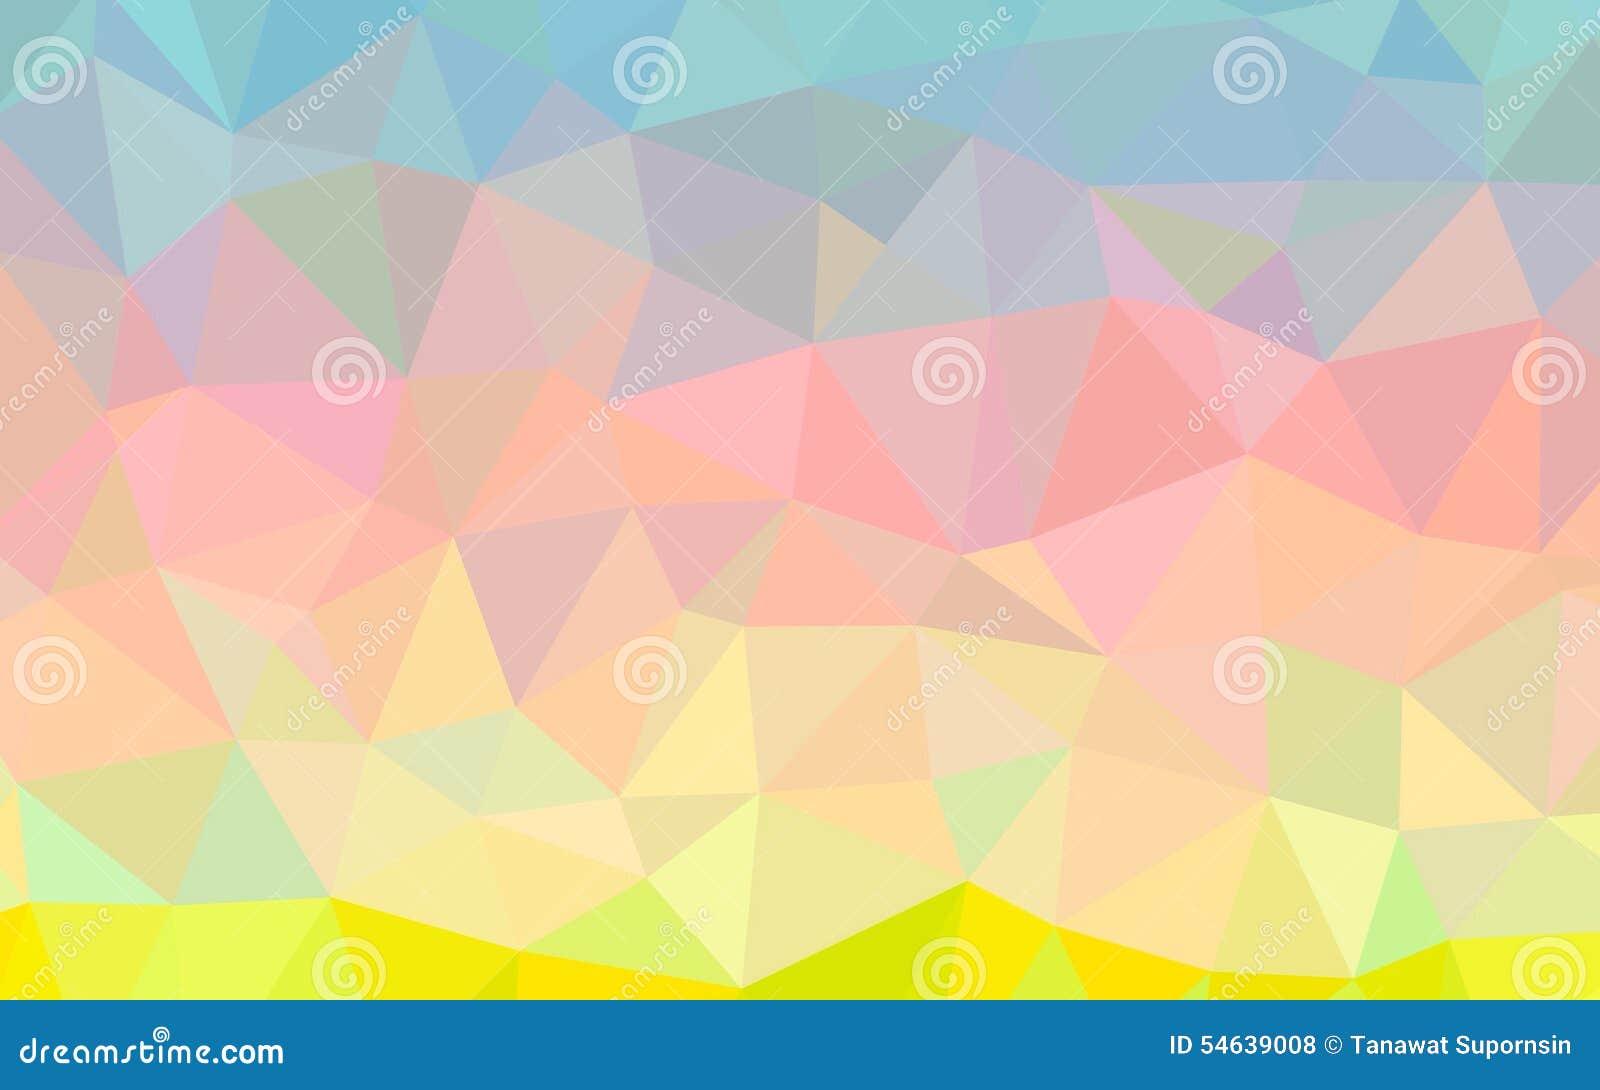 Warm Color Wallpaper